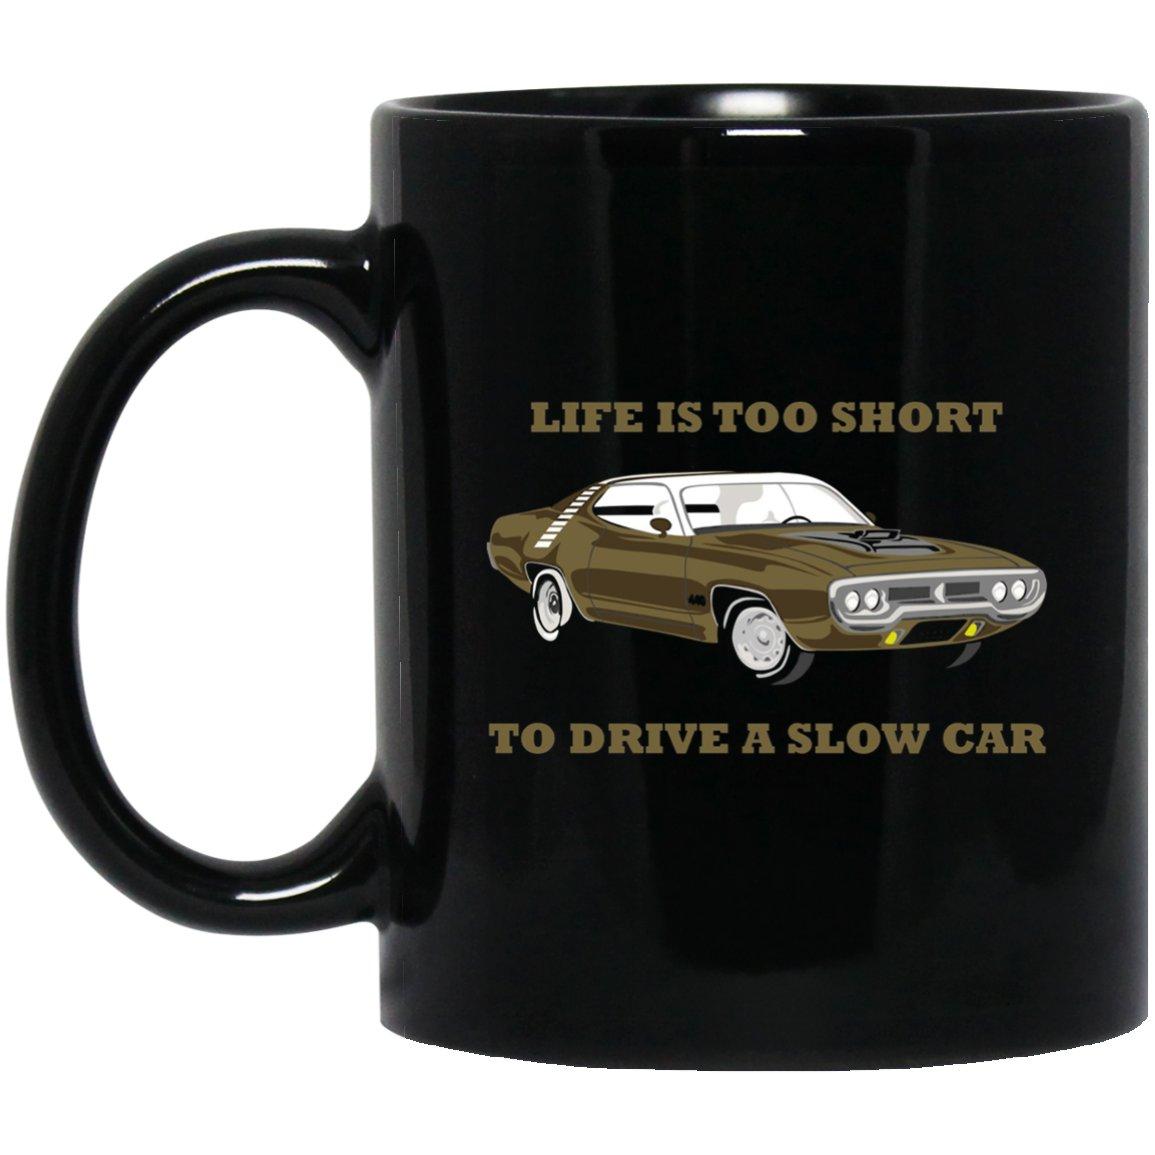 Life Is Too Short To Drive A Slow Car American Muscle Cars Black  Mug Black Ceramic 11oz Coffee Tea